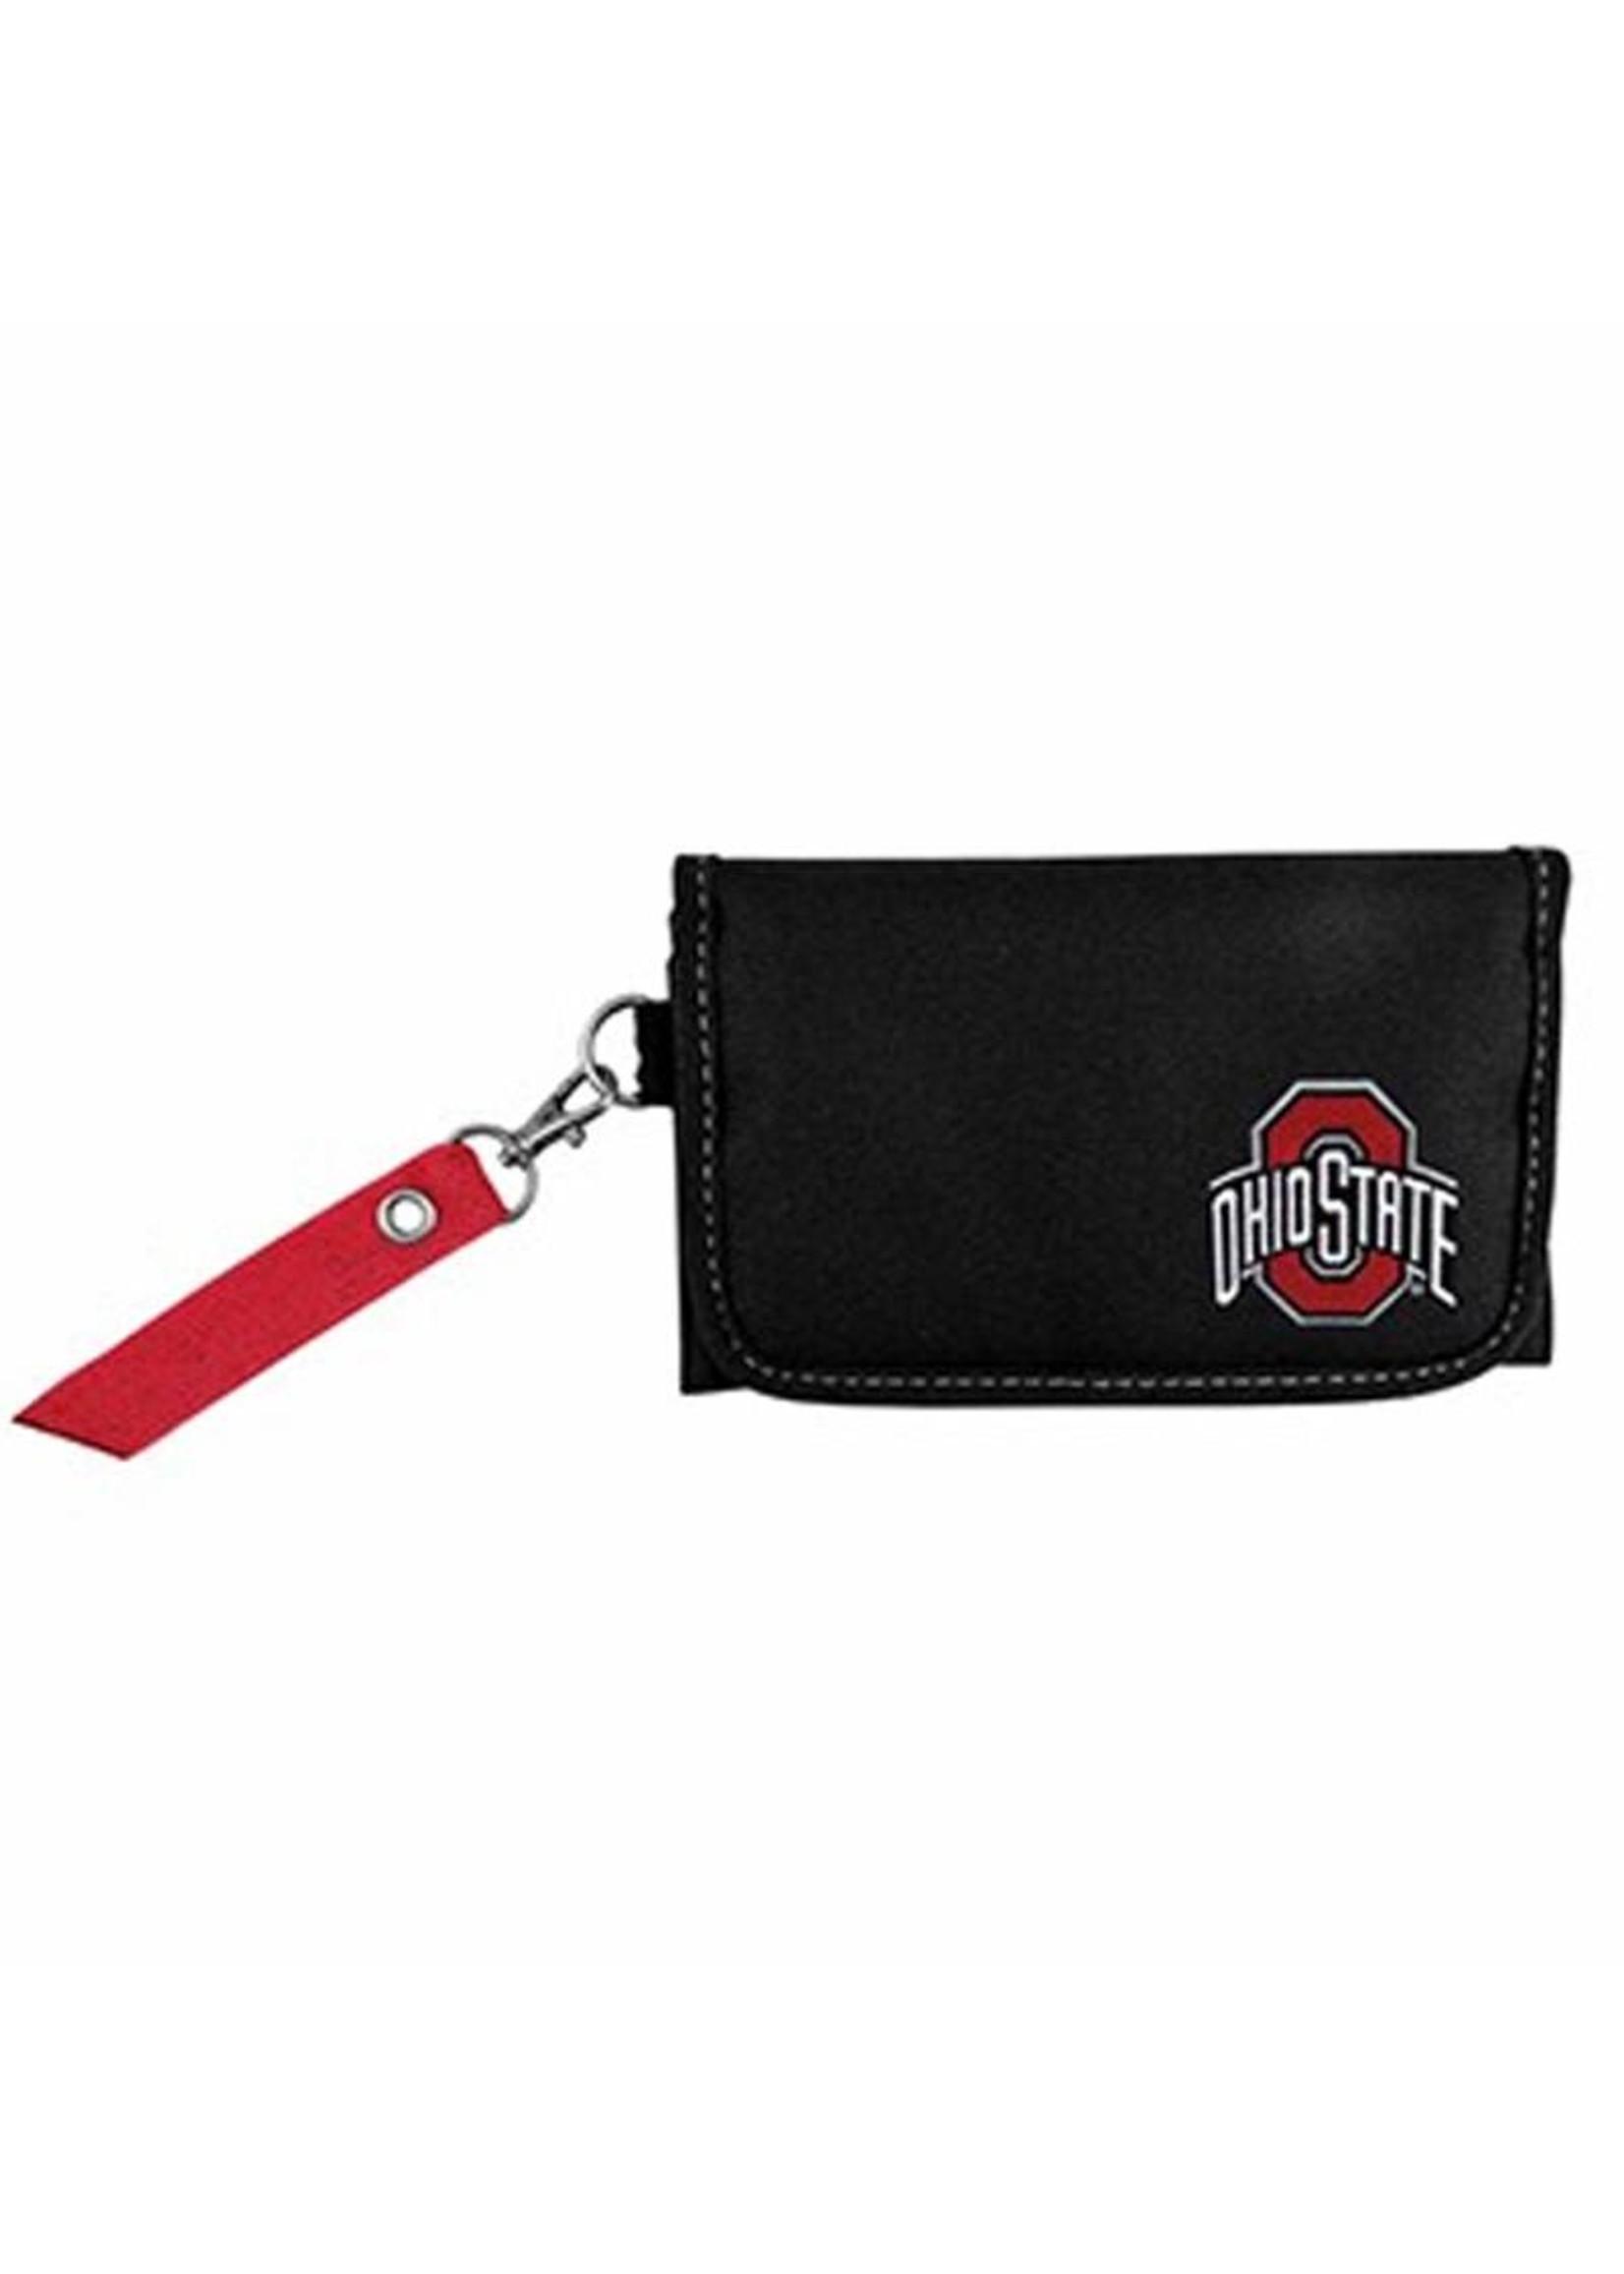 Ohio State University Women's Wallet